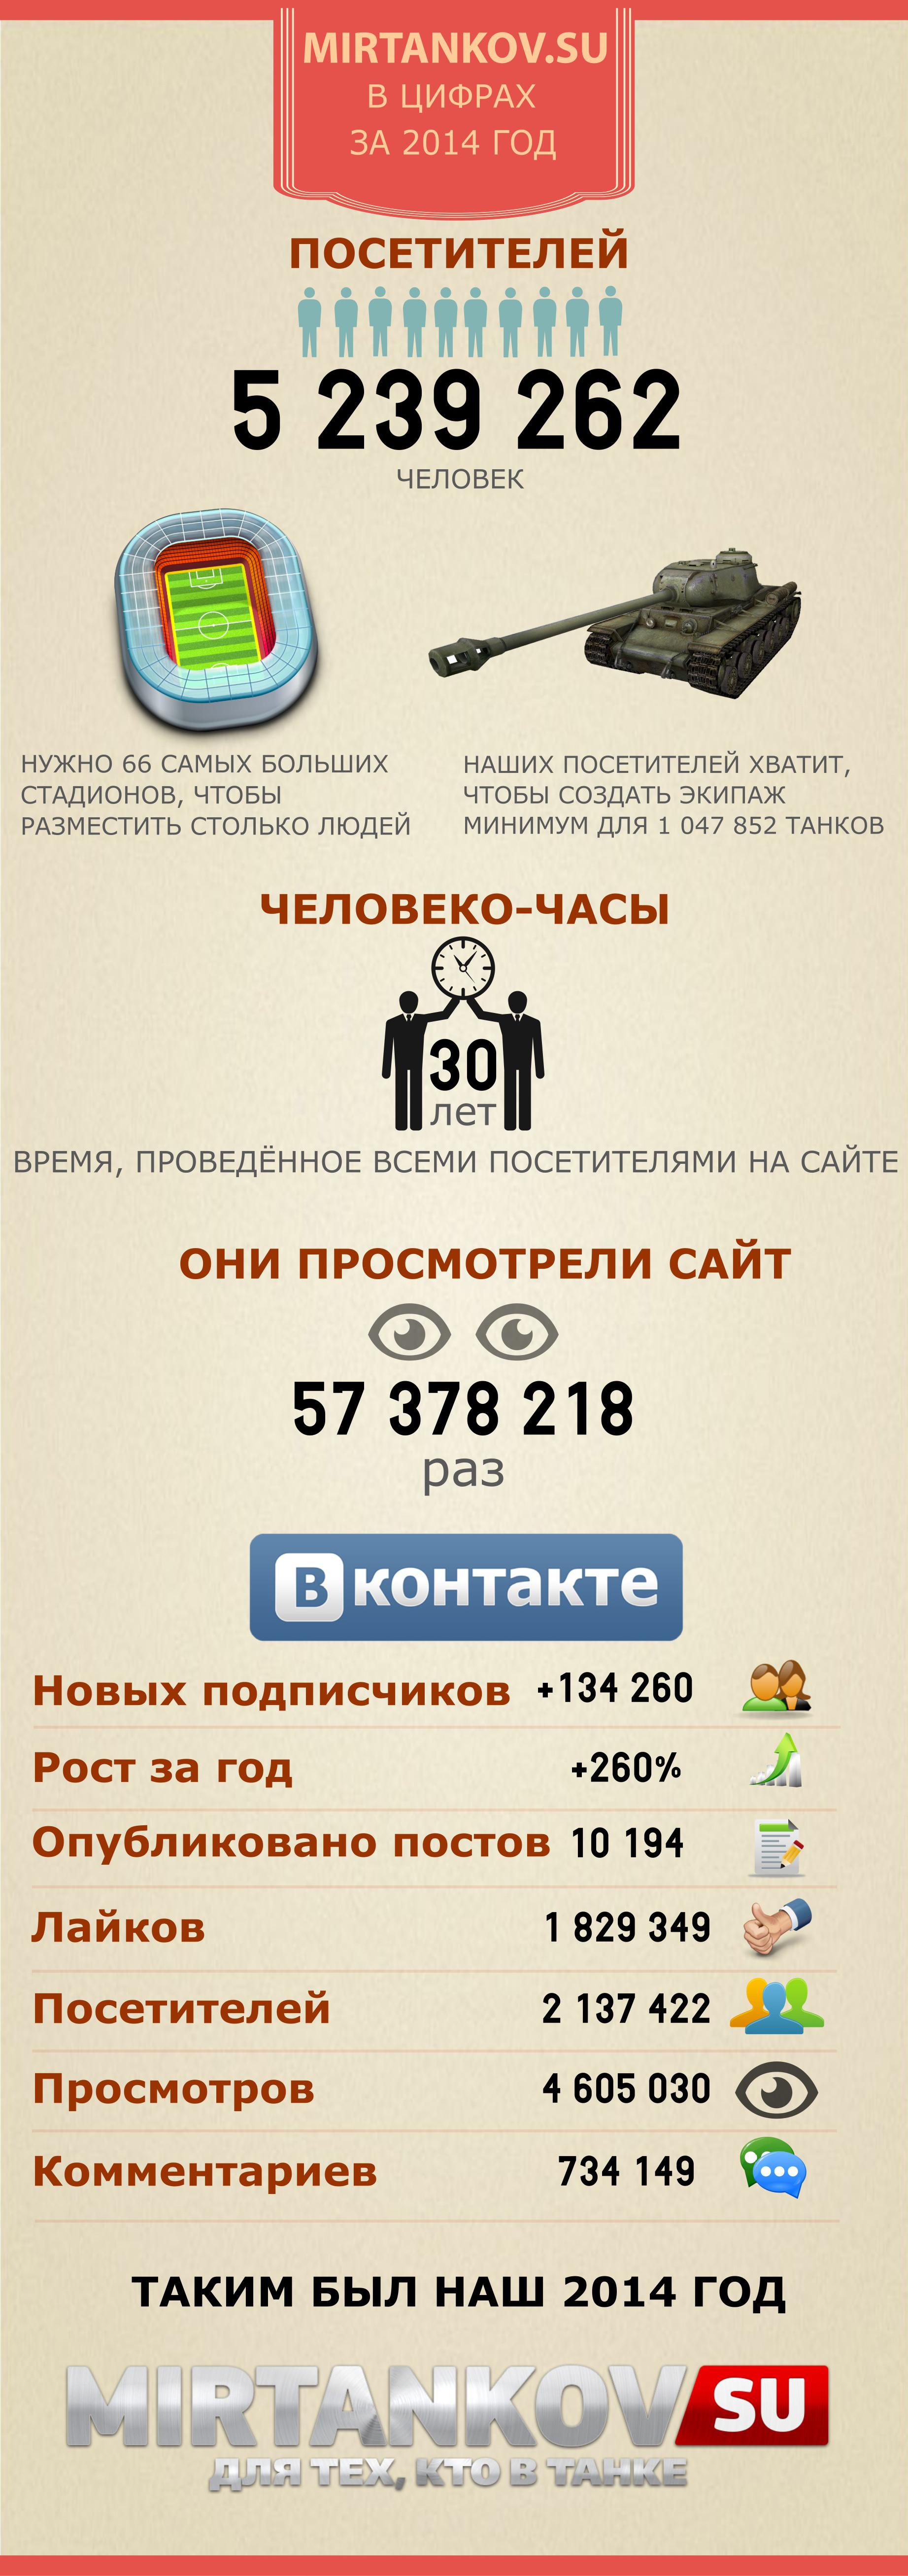 mirtankov.su в цифрах за 2014 год инфографика